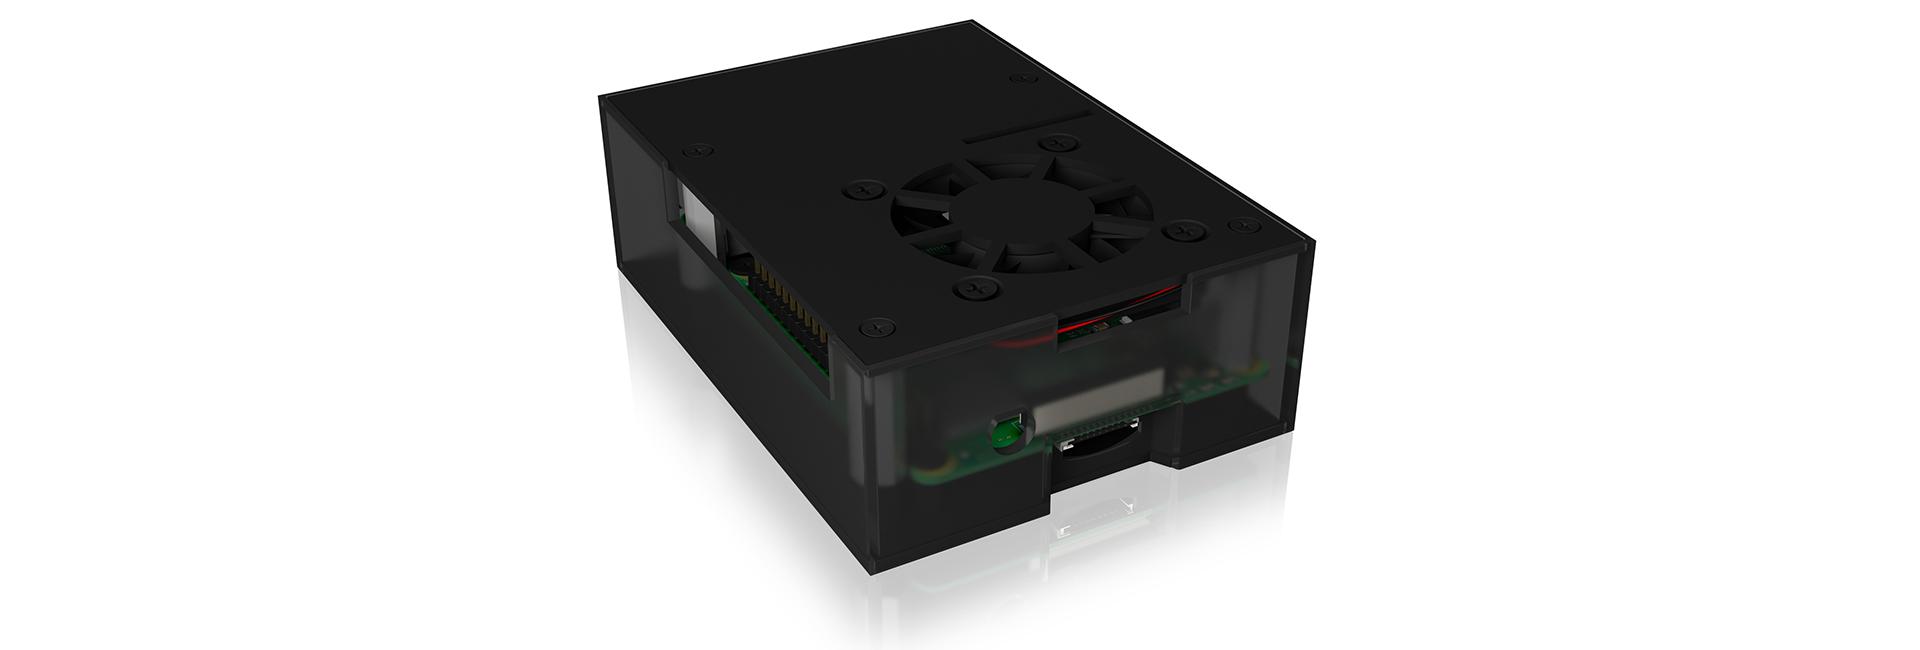 ICY BOX IB-RP108 - Hülle - Raspberry Pi - Raspberry Pi - Anthrazit - Schwarz - Aluminium - Kunststoff - China